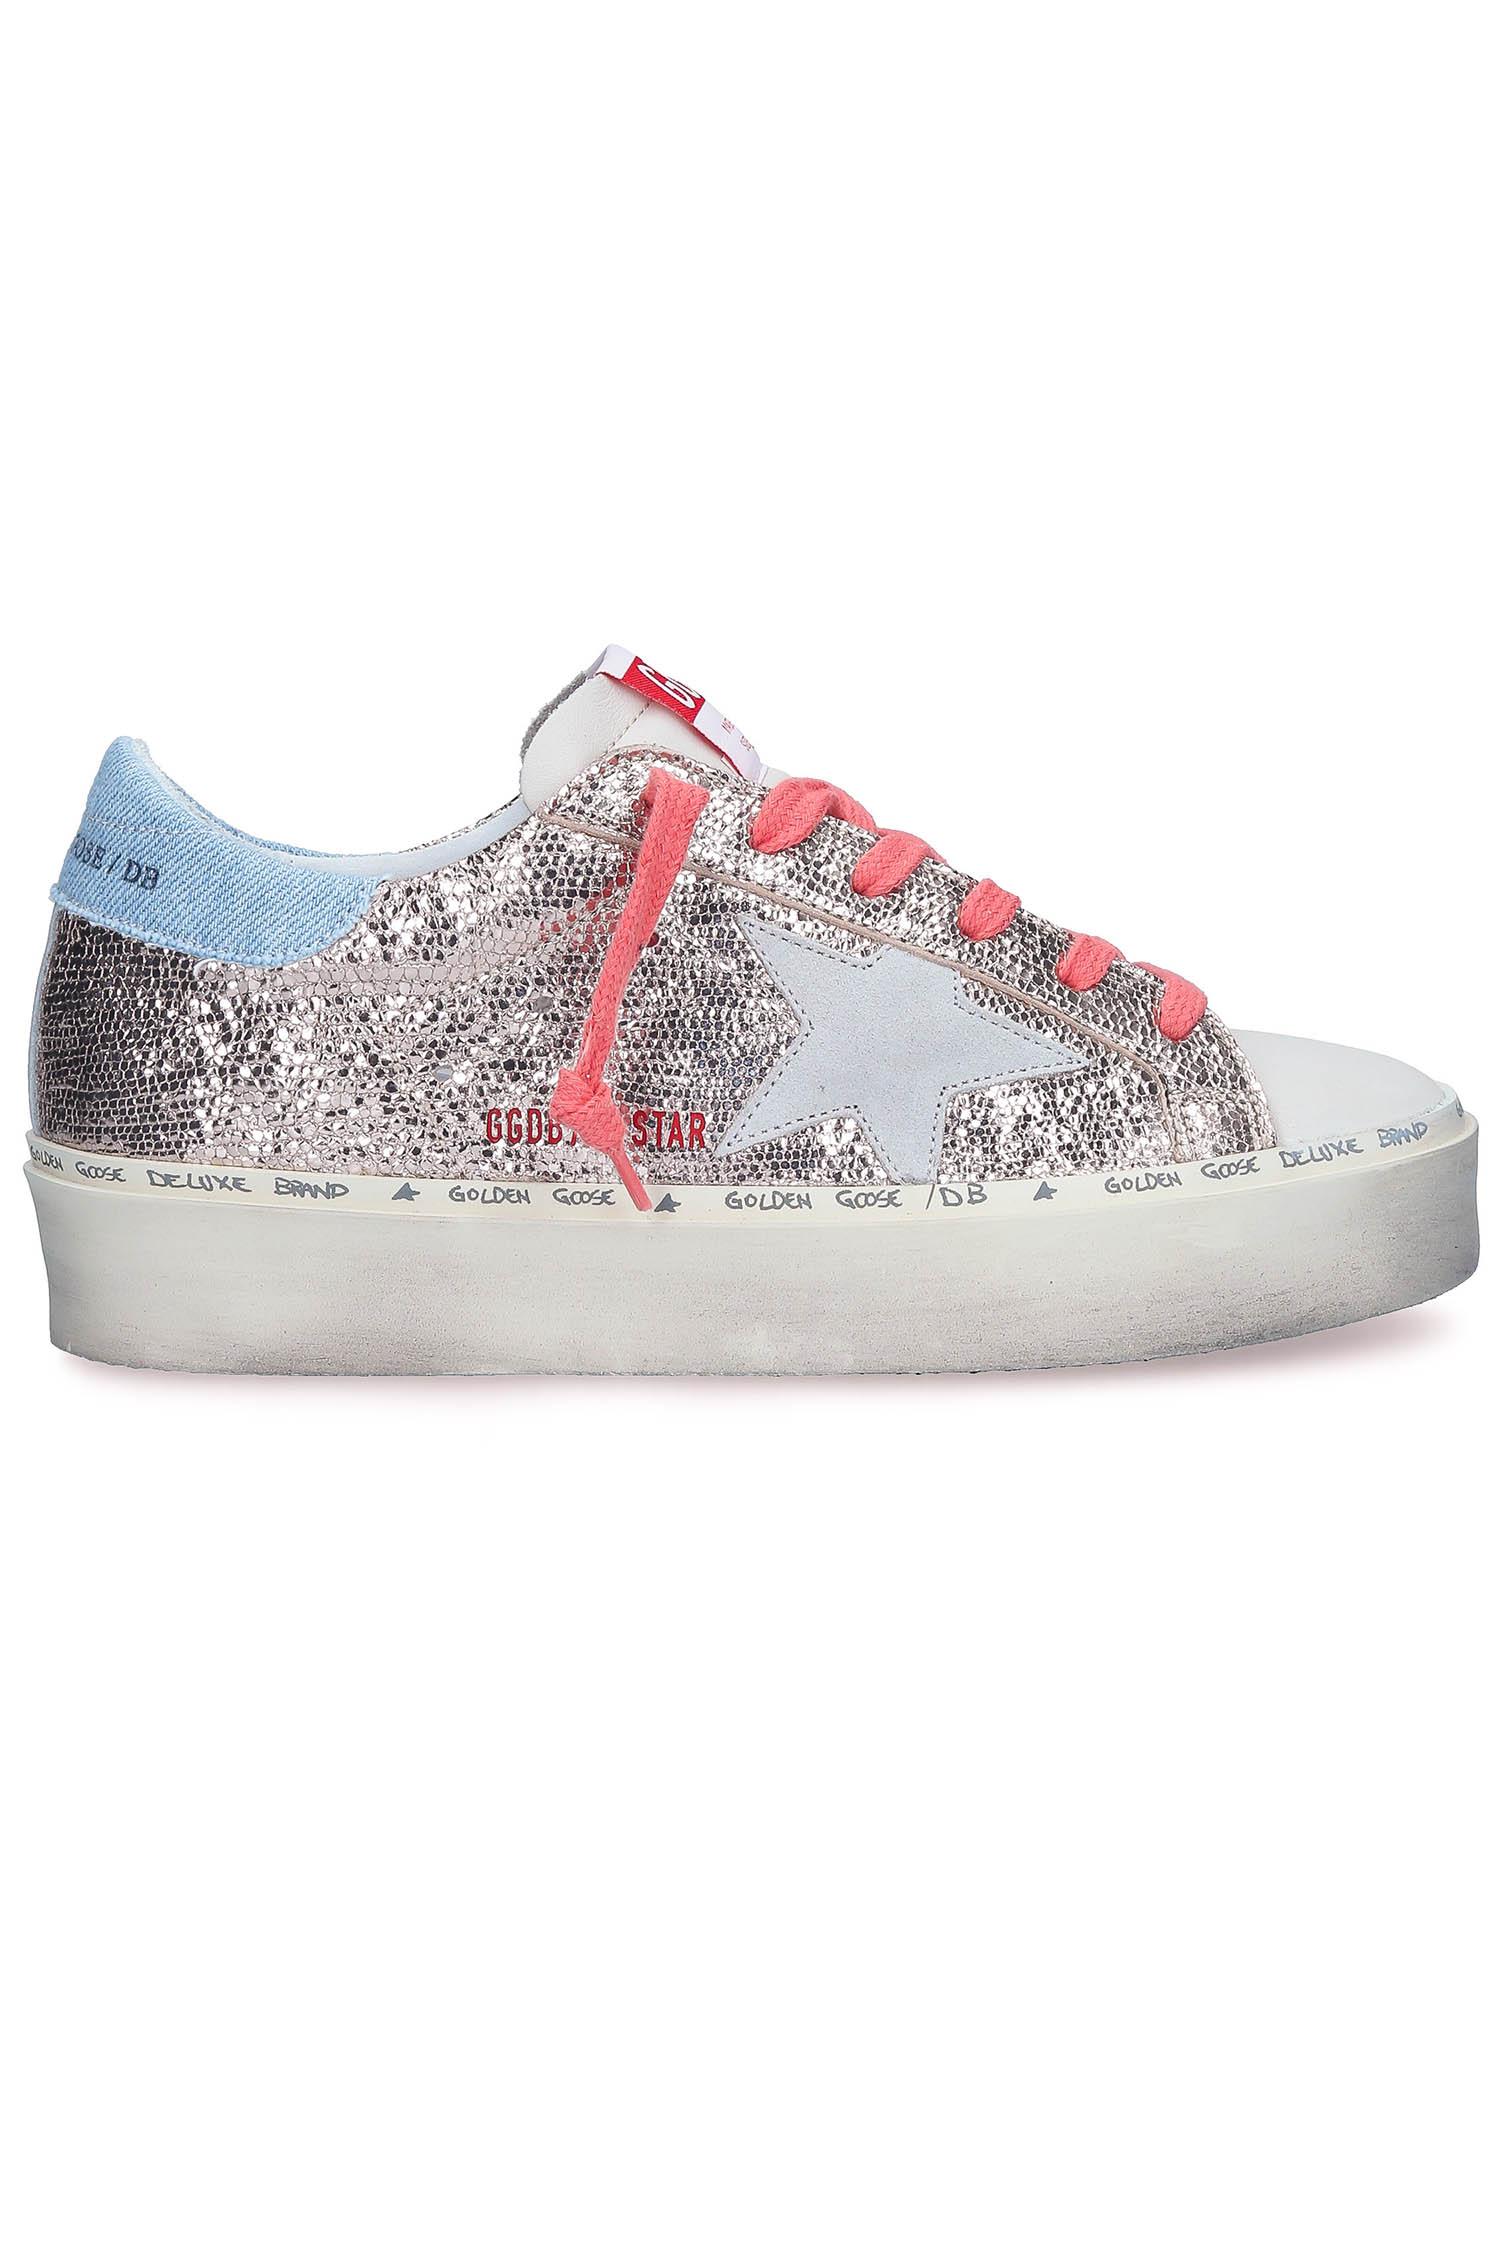 nouveau produit 61f84 bd630 Sneakers Hi Star Lizard-Ice Star